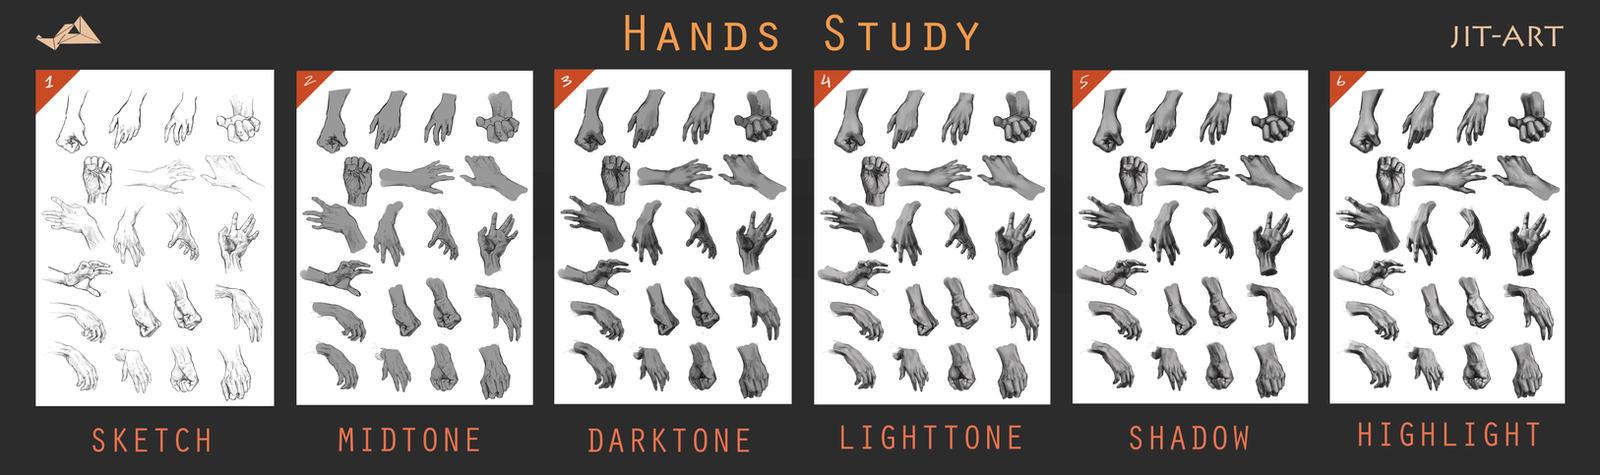 Hands Study Process Steps. by Jit-Art